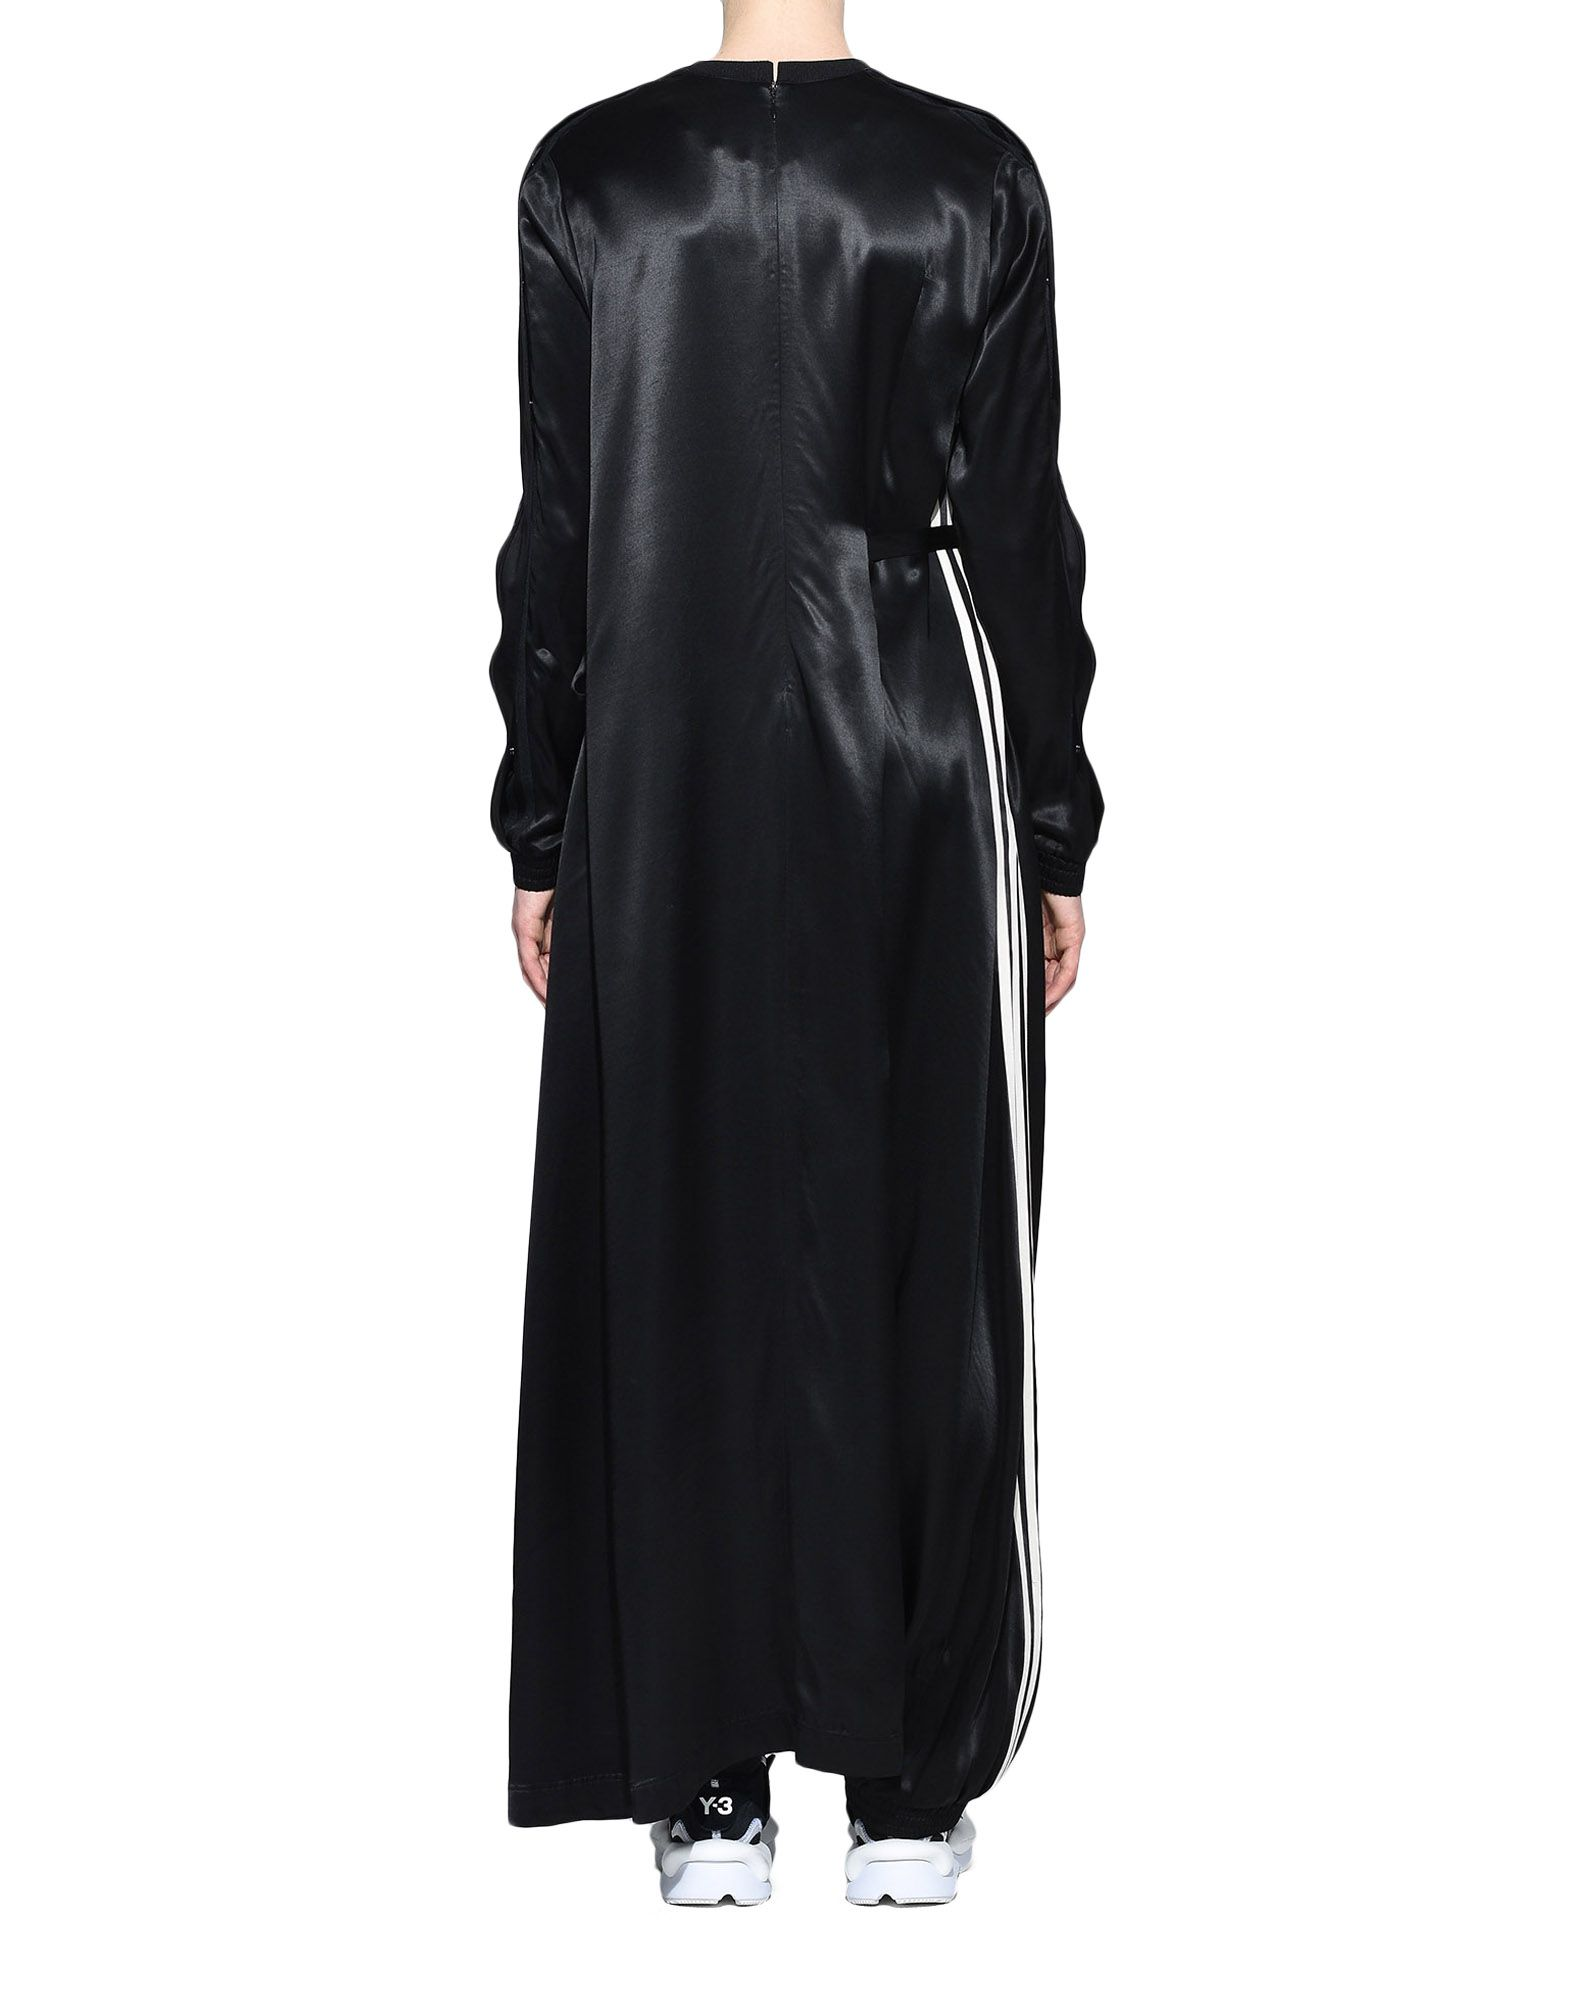 Y-3 Y-3 3-Stripes Lux Track Dress Длинное платье Для Женщин d